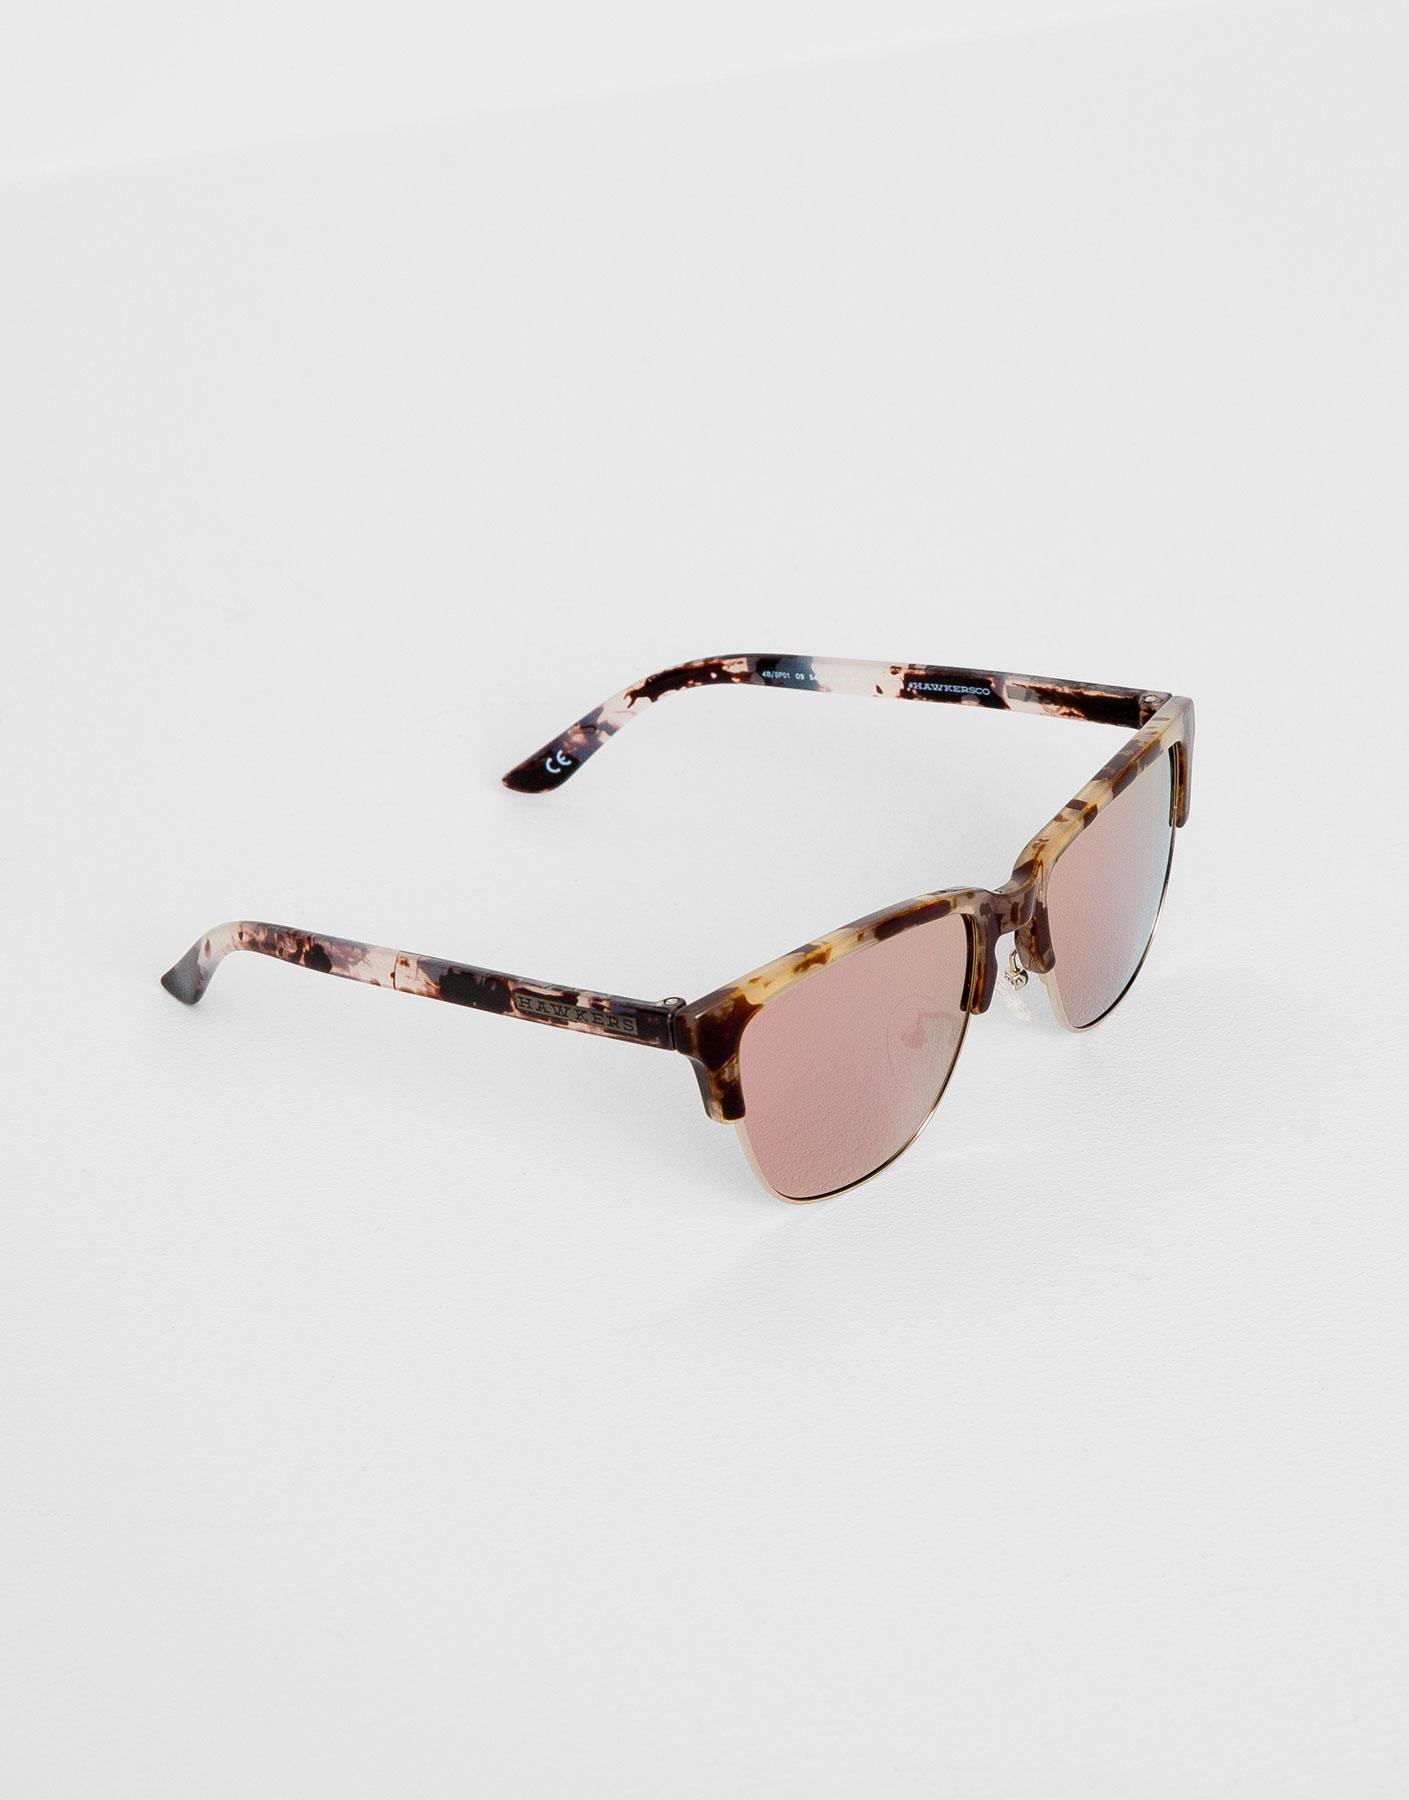 Hawkers tortoiseshell sunglasses